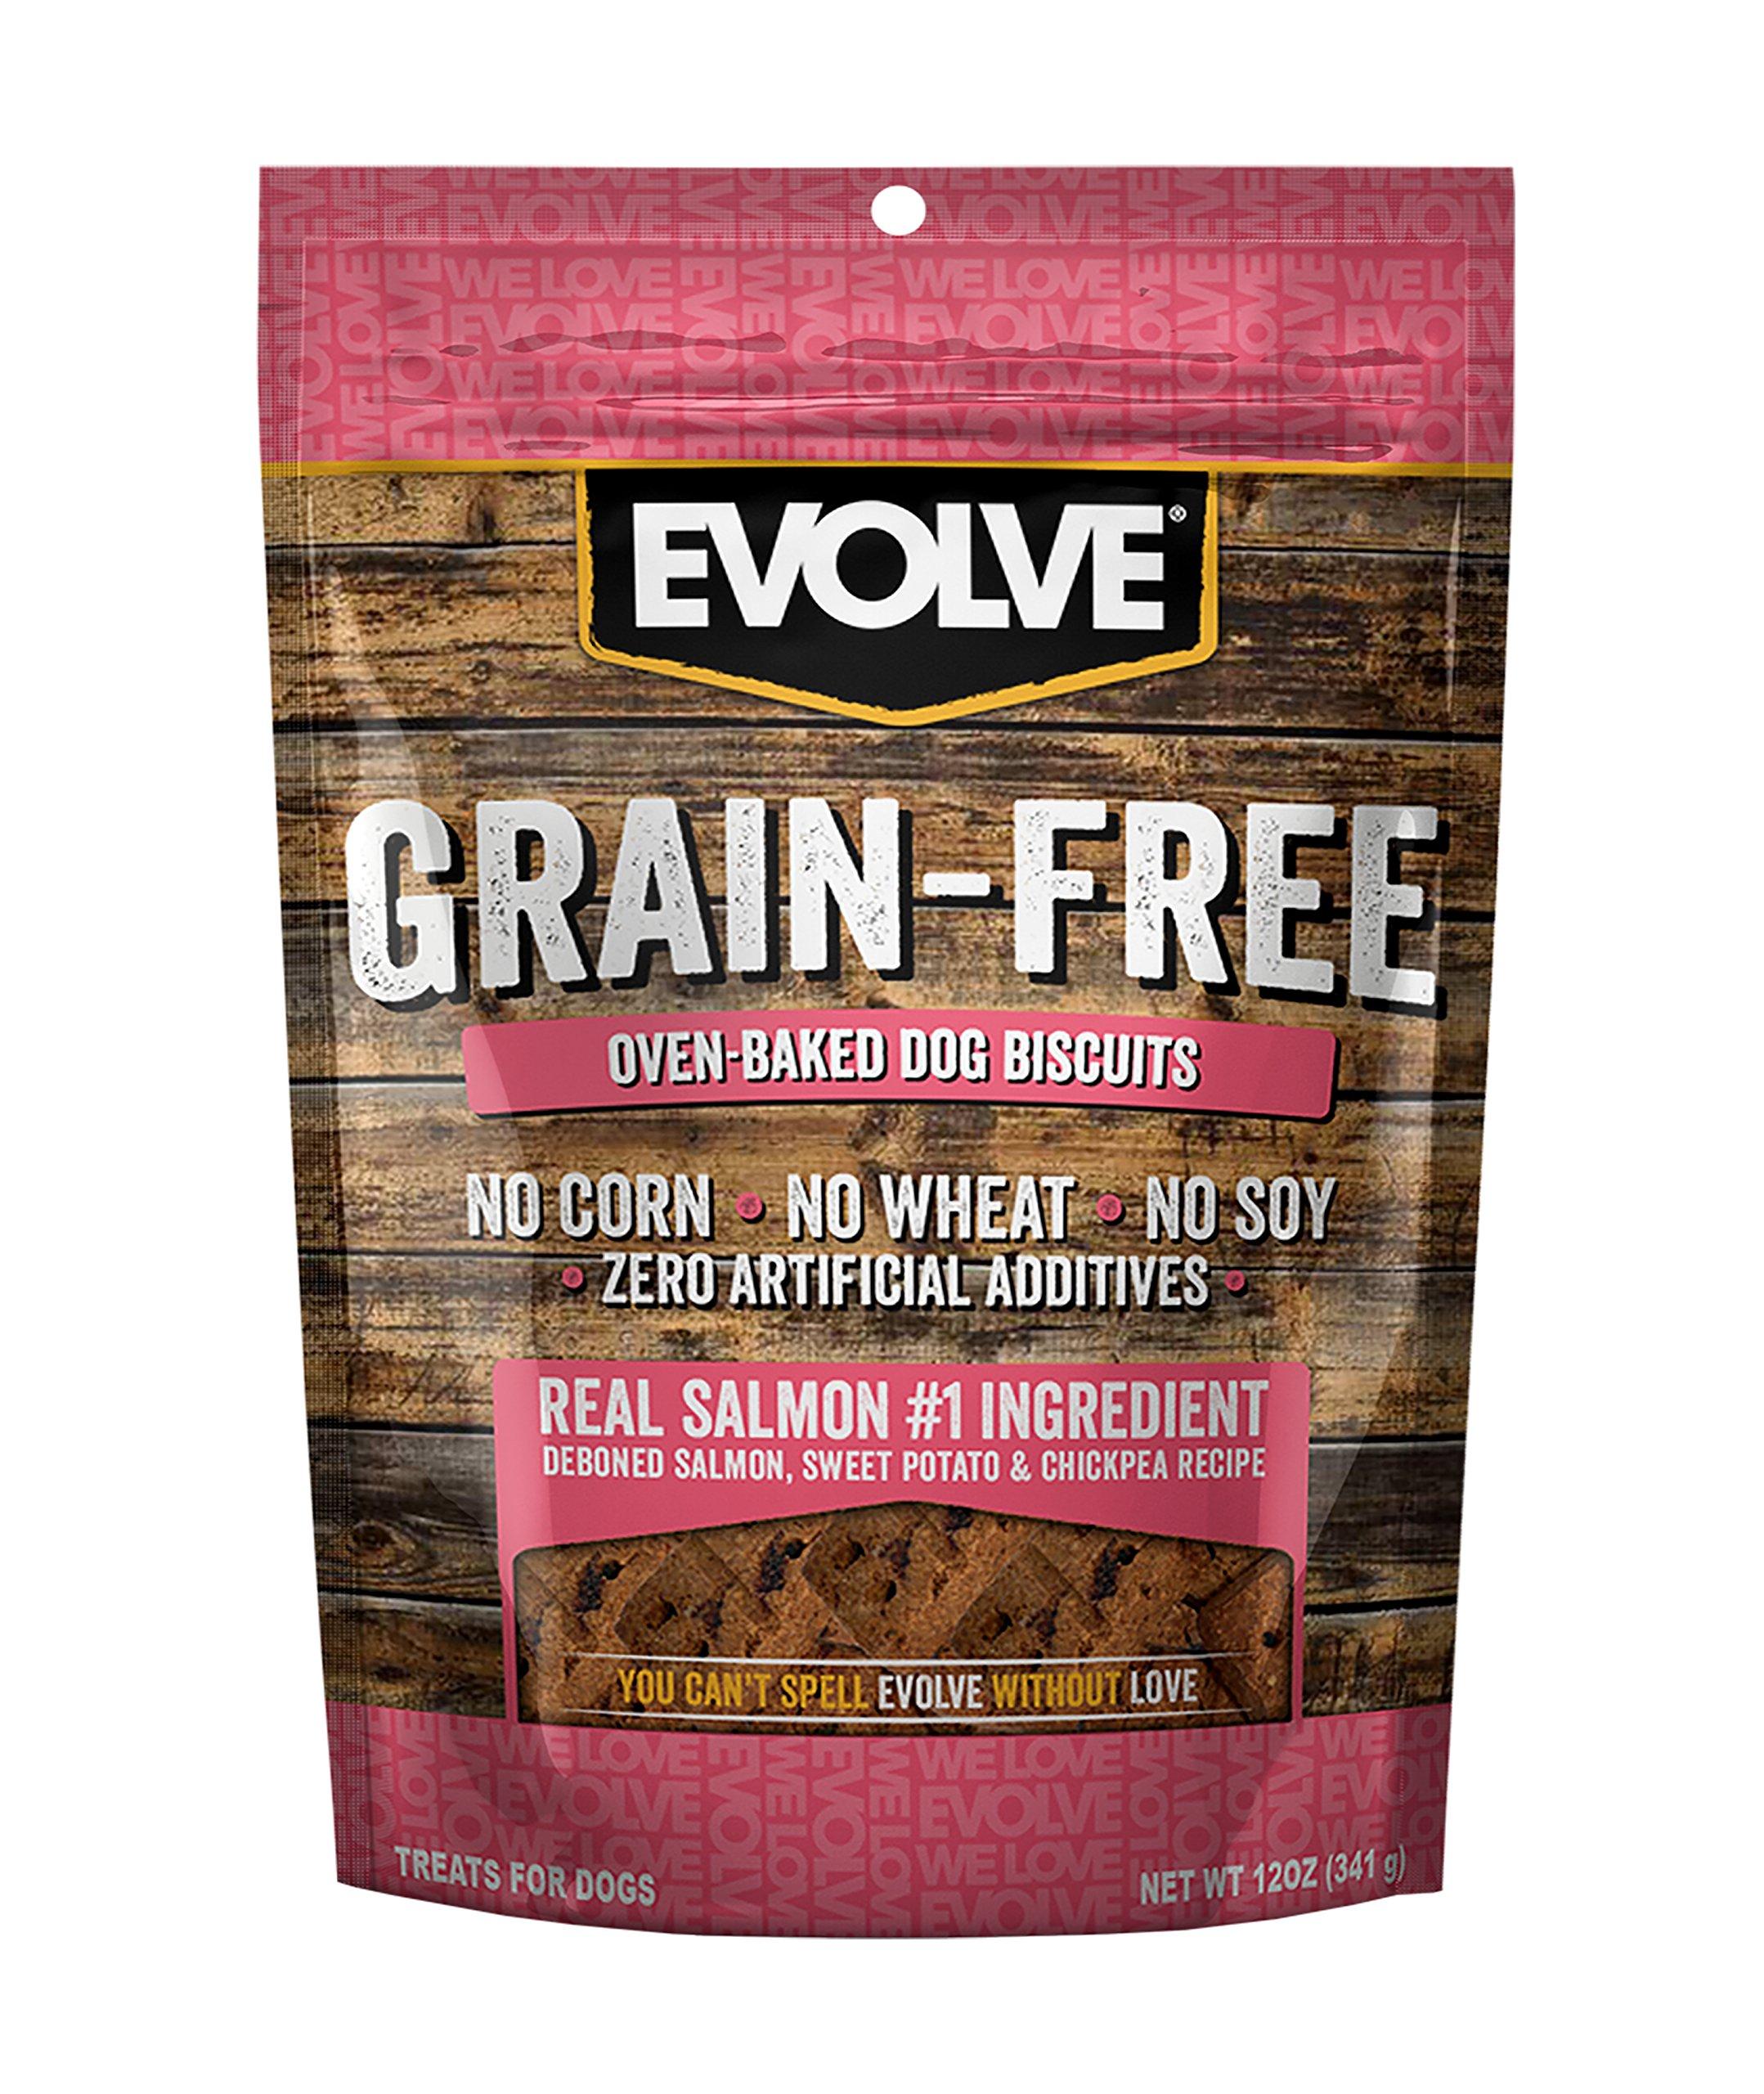 Evolve Oven Baked Grain Free Deboned Salmon Biscuits, 12oz